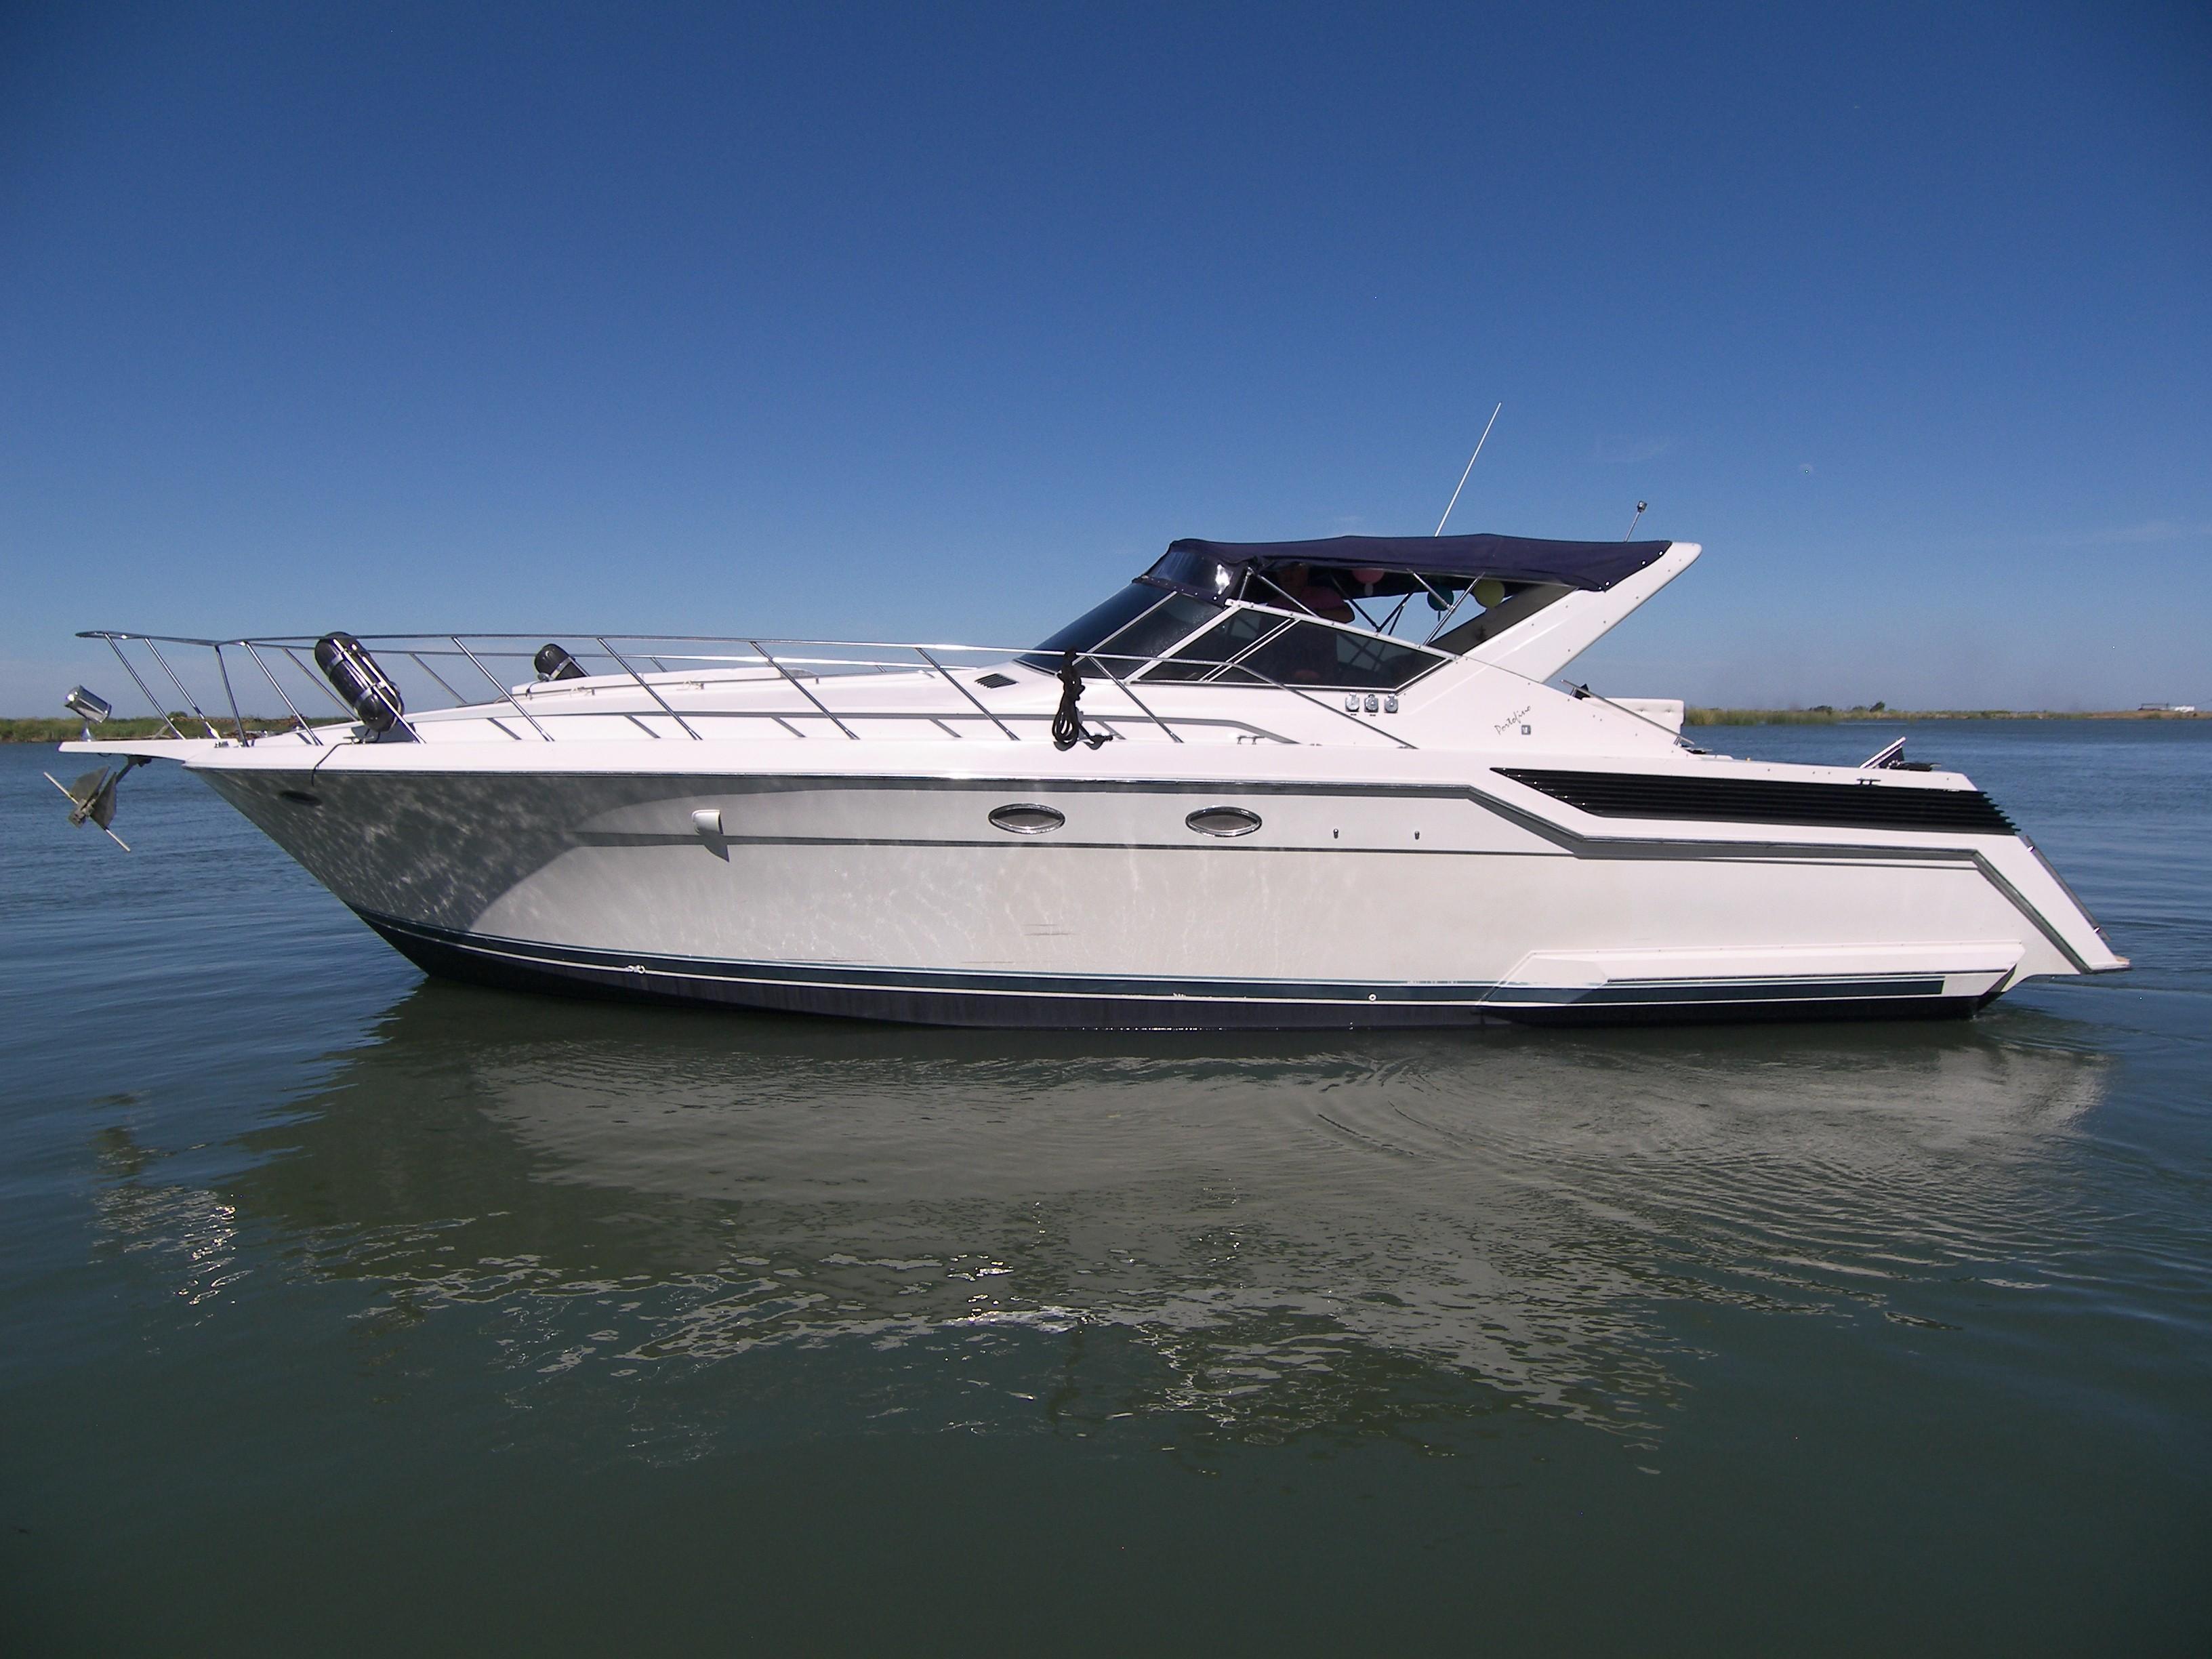 1988 Wellcraft 43 Portofino Power Boat For Sale Www